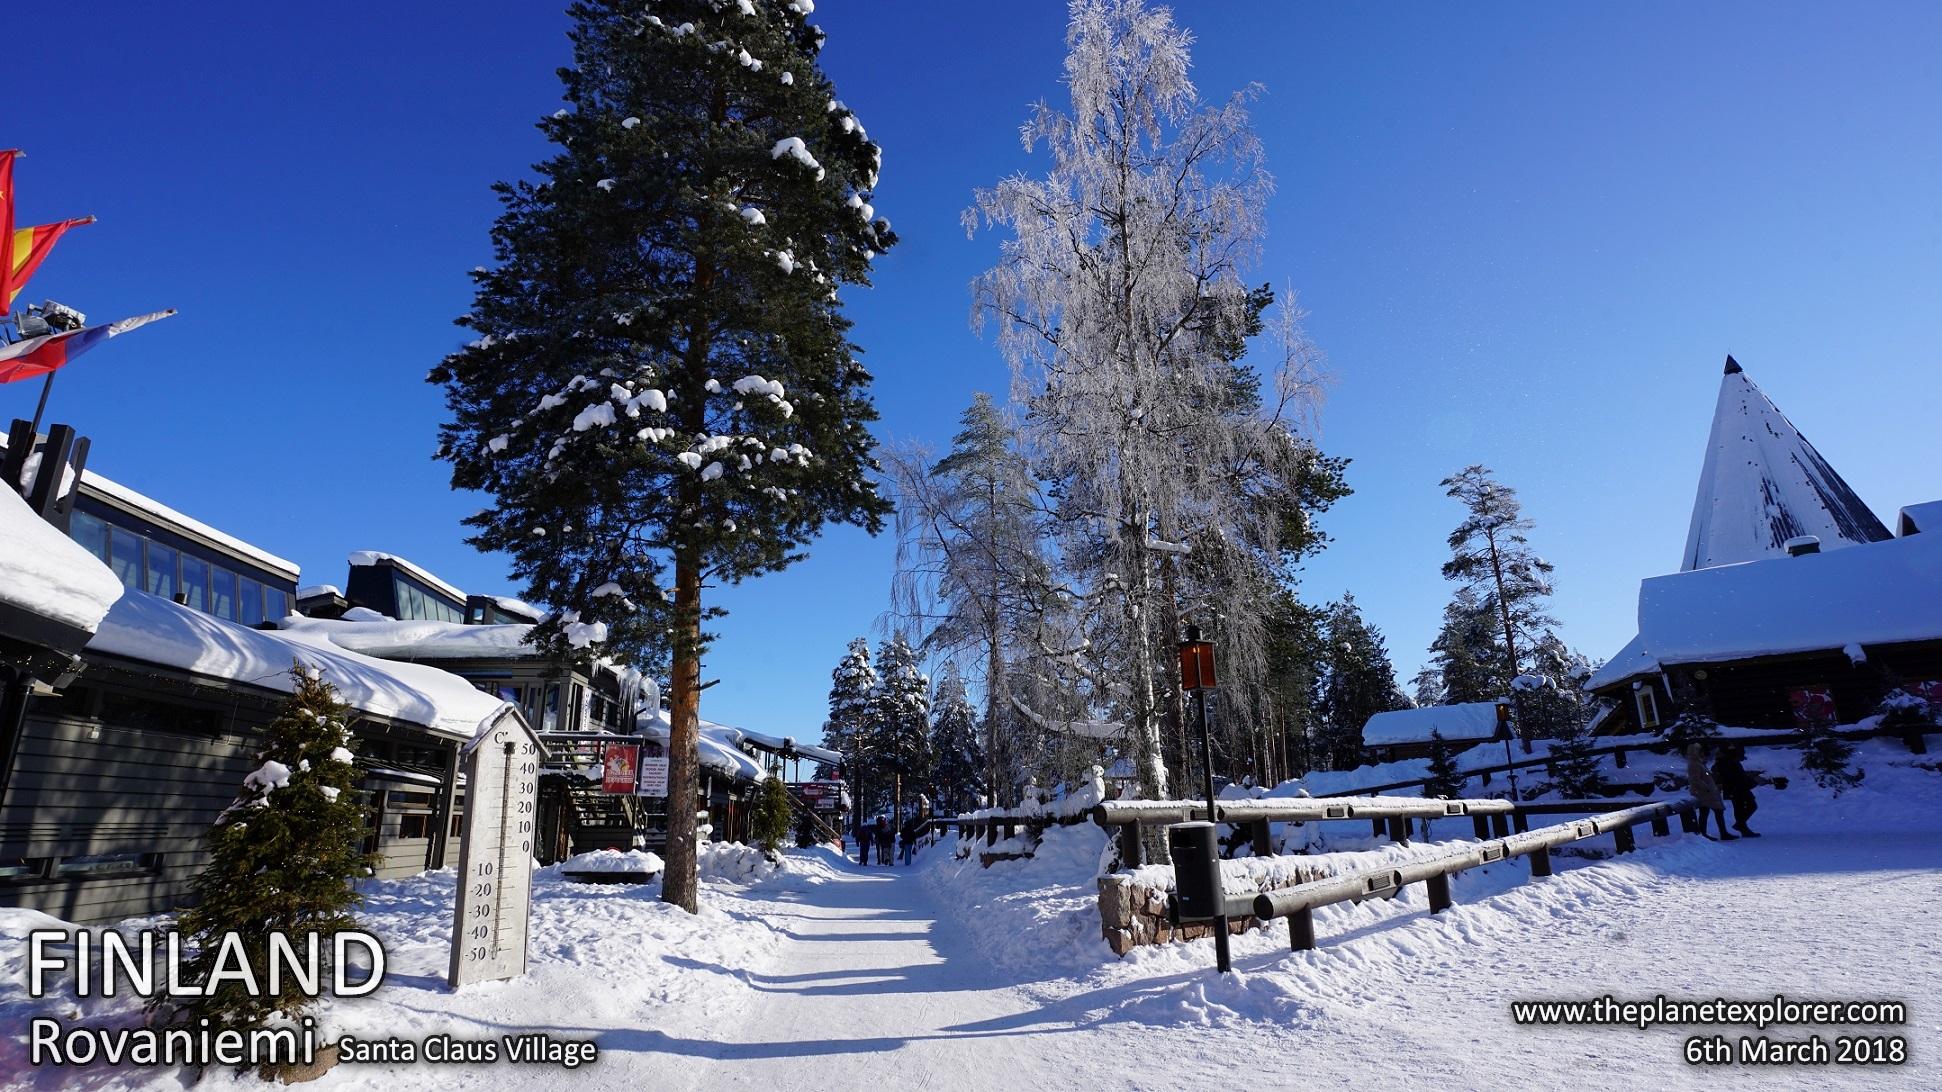 20180306_1151_Finland_Rovaniemi_Santa Claus Village_DSC09715_Sony a7R2_LR_@www